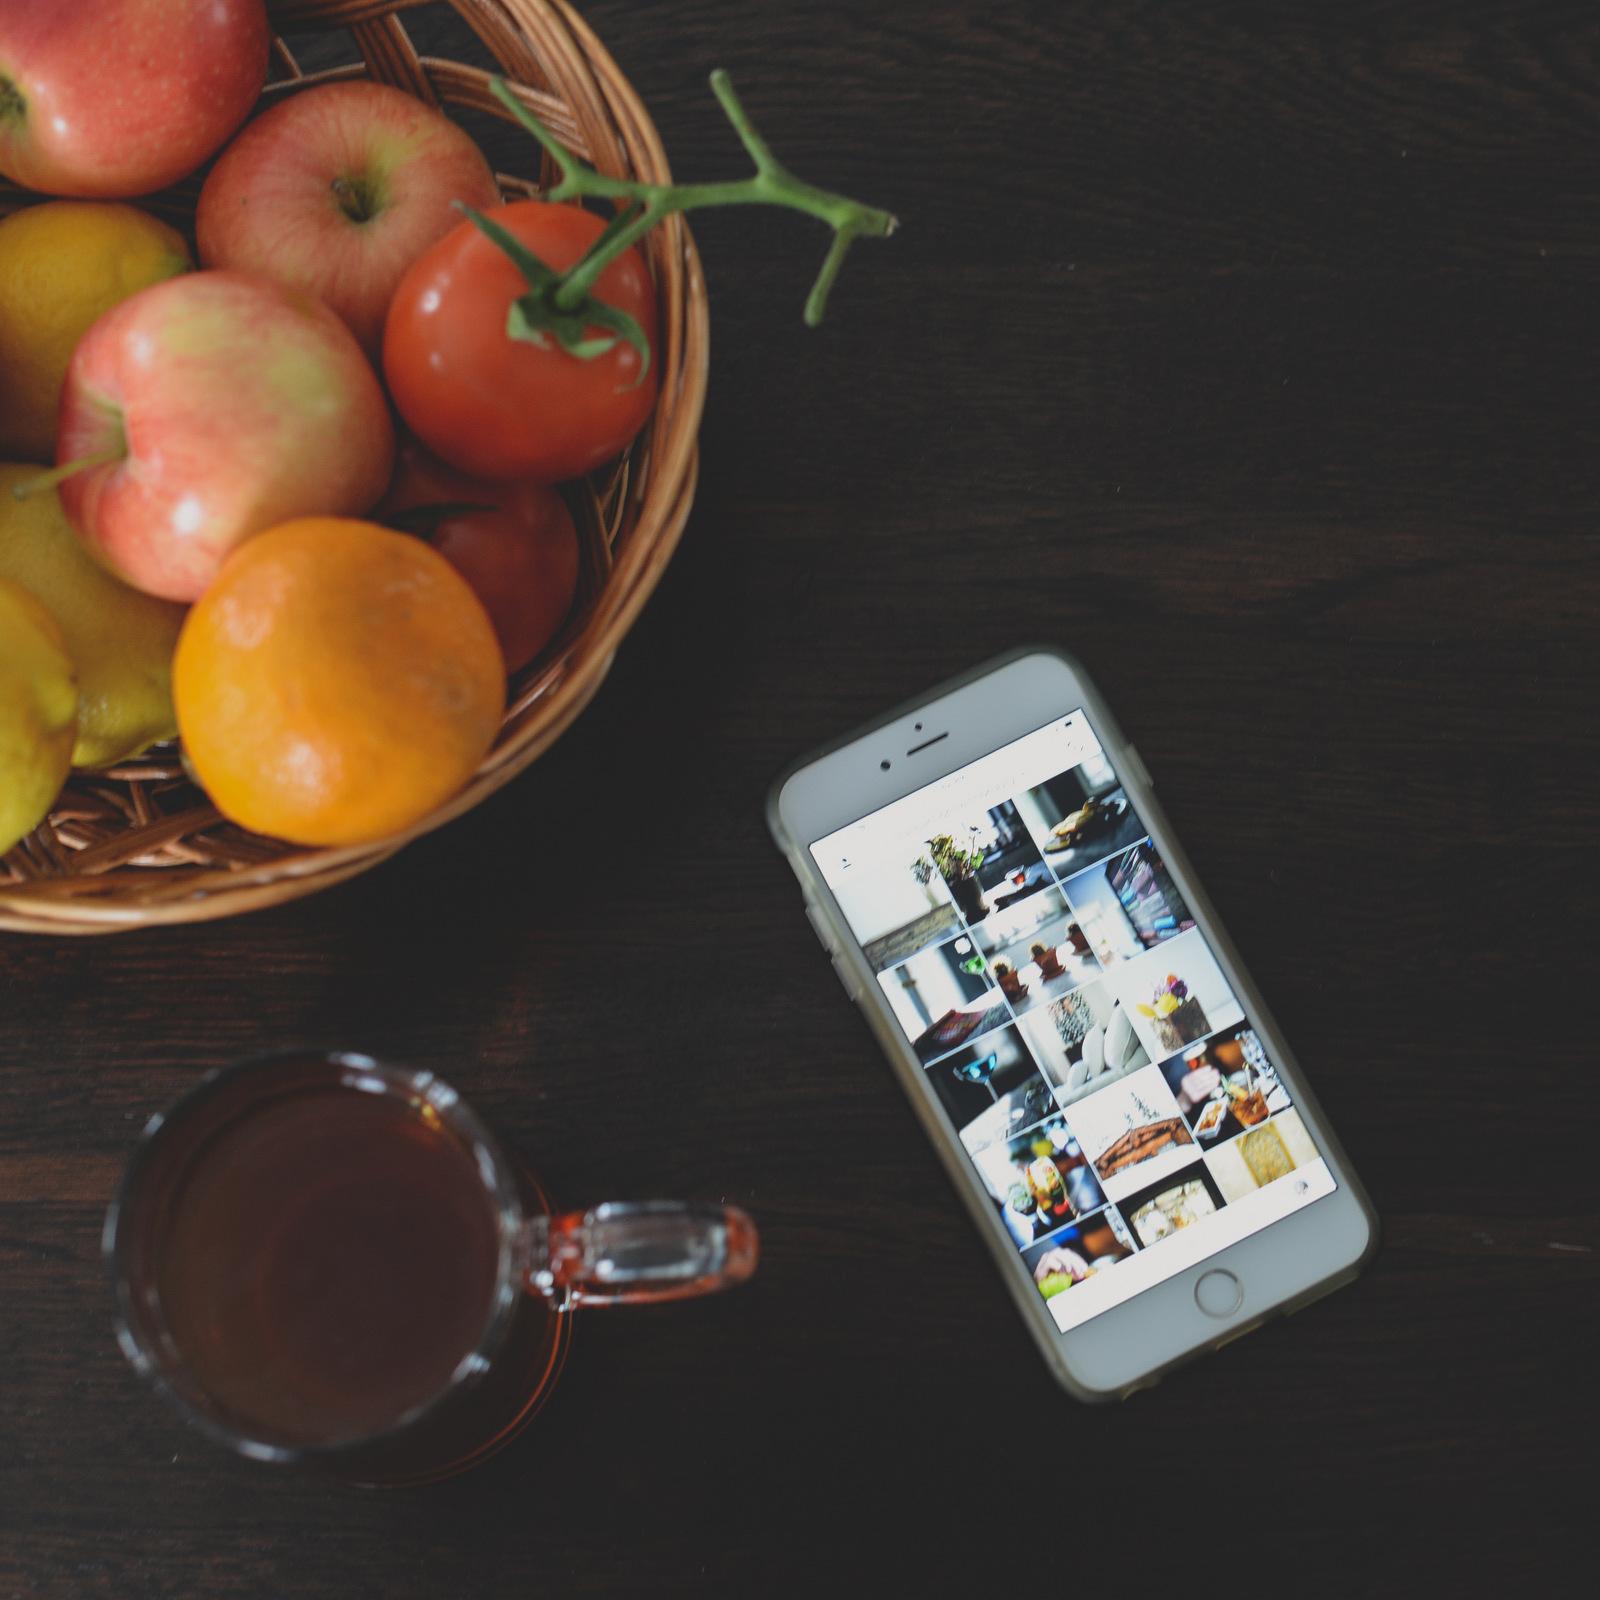 iPhone and tea